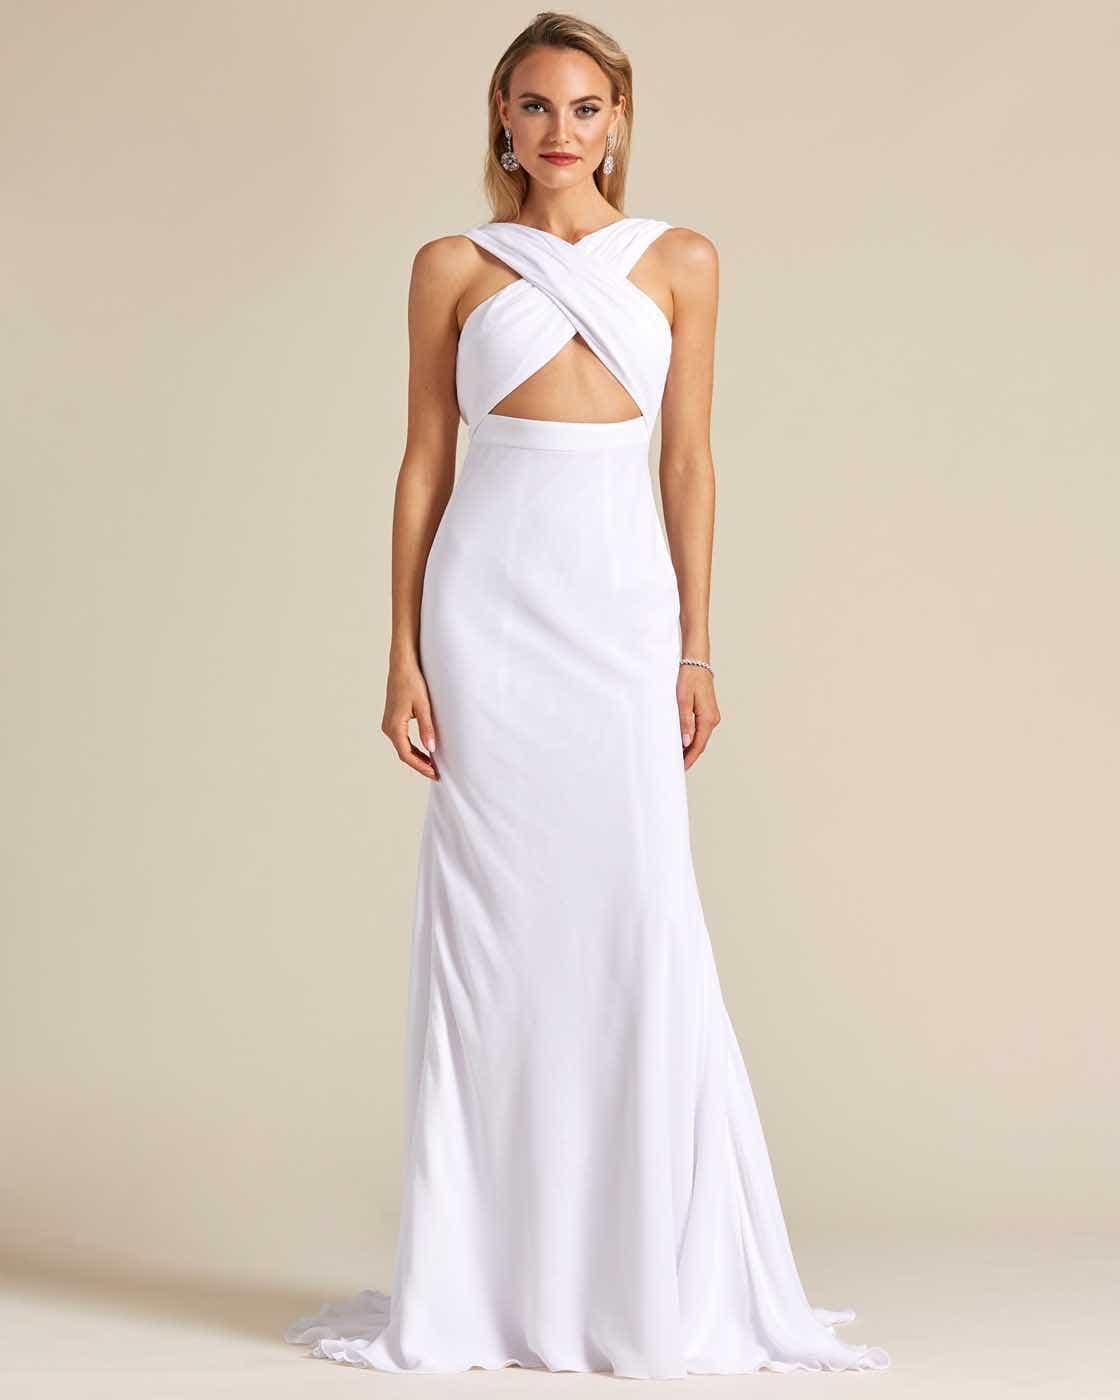 Ivory White Criss Cross Wedding Dress - Front